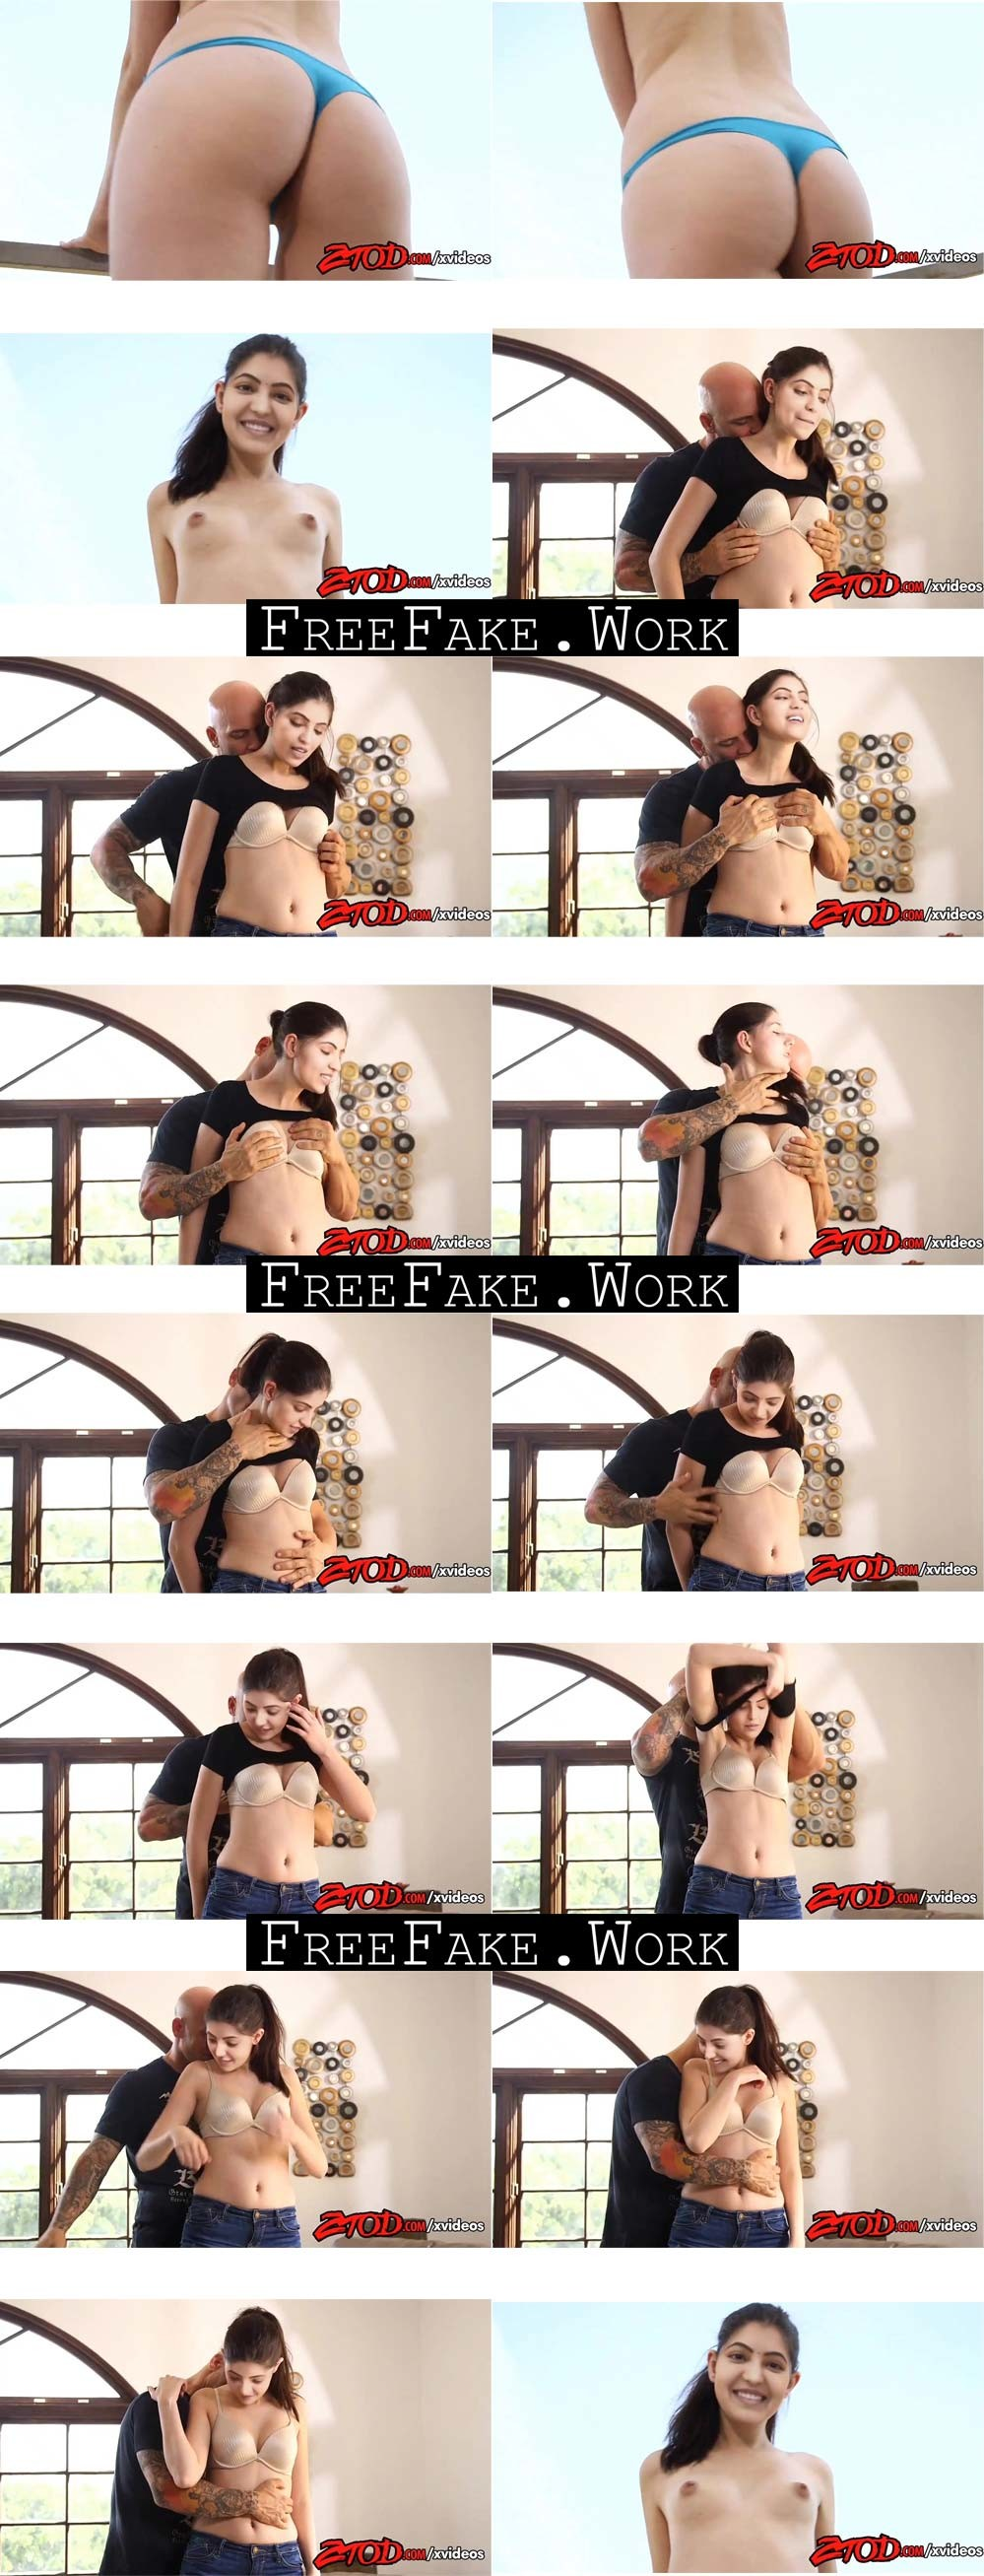 Athulya-Ravi-DeepFake-bra-pressed-topless-small-boobs-Clip-screenshot.jpg